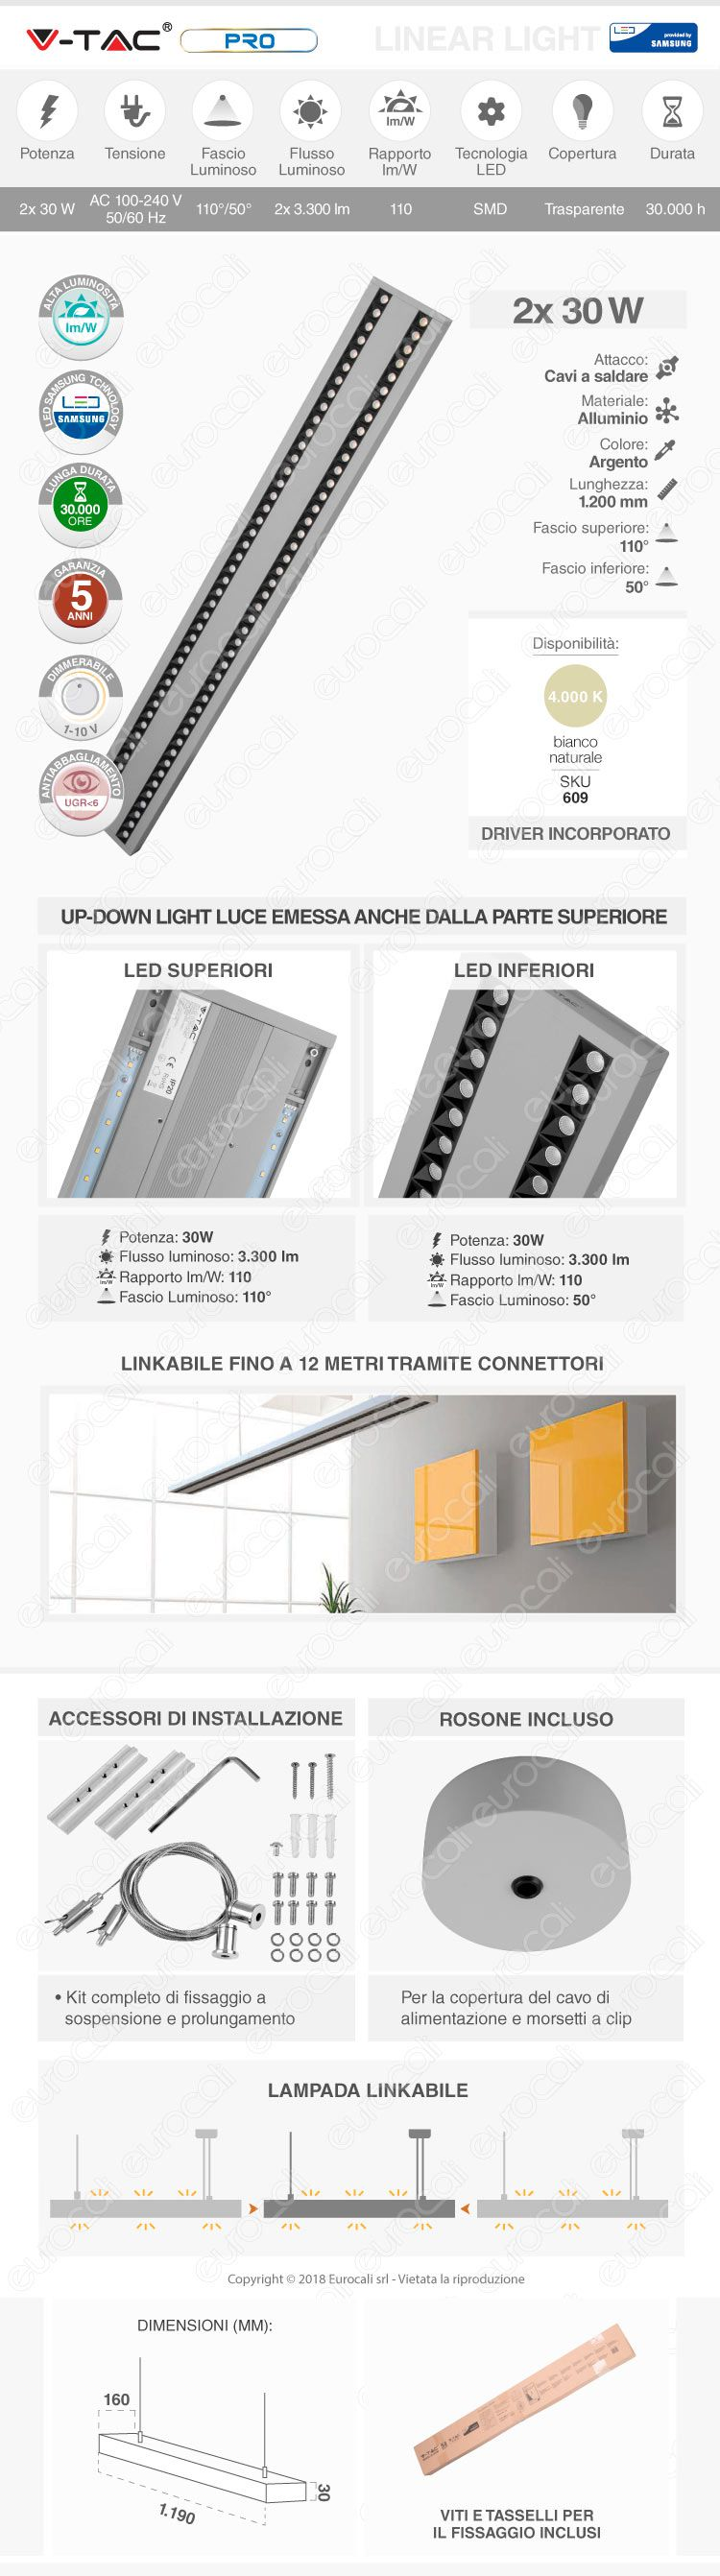 V-Tac PRO VT-7-62 Lampada LED a Sospensione Linear Light 60W Chip Samsung Silver Body Dimmerabile